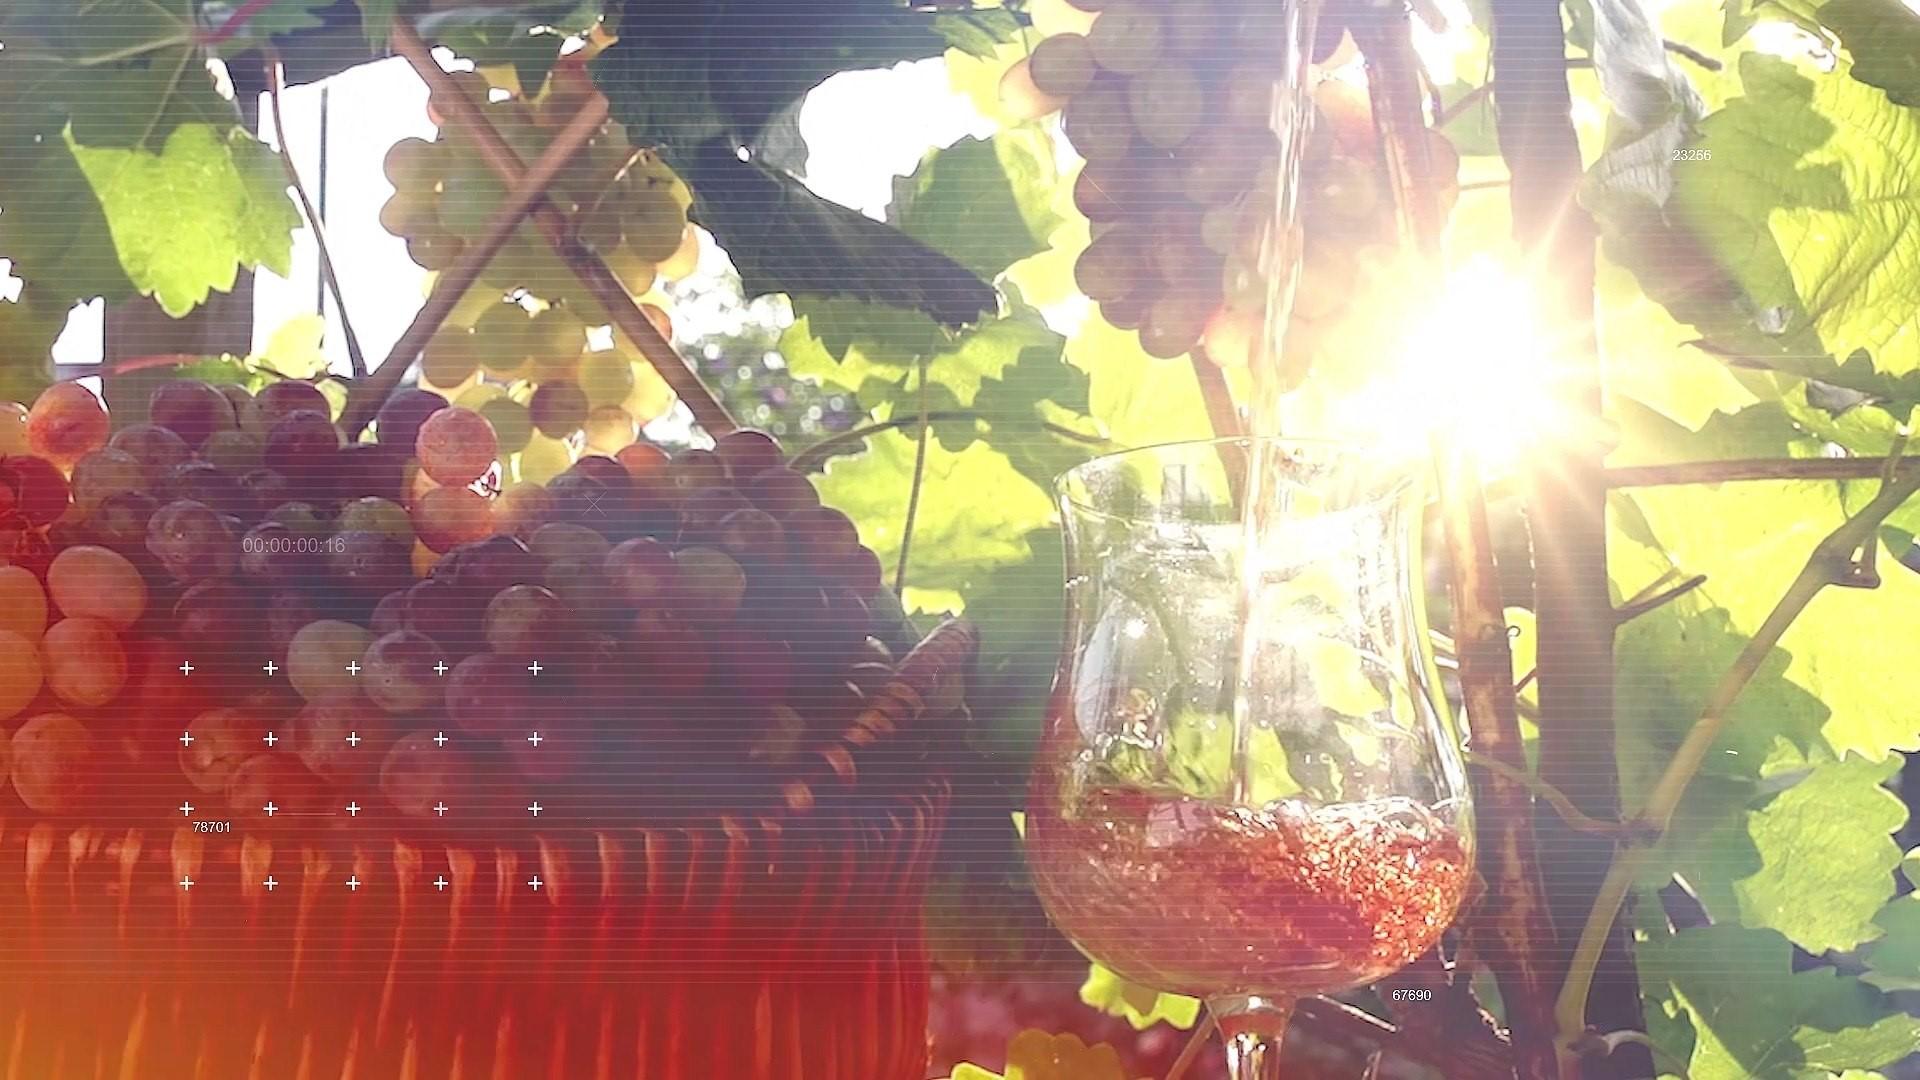 Vinhos Frank